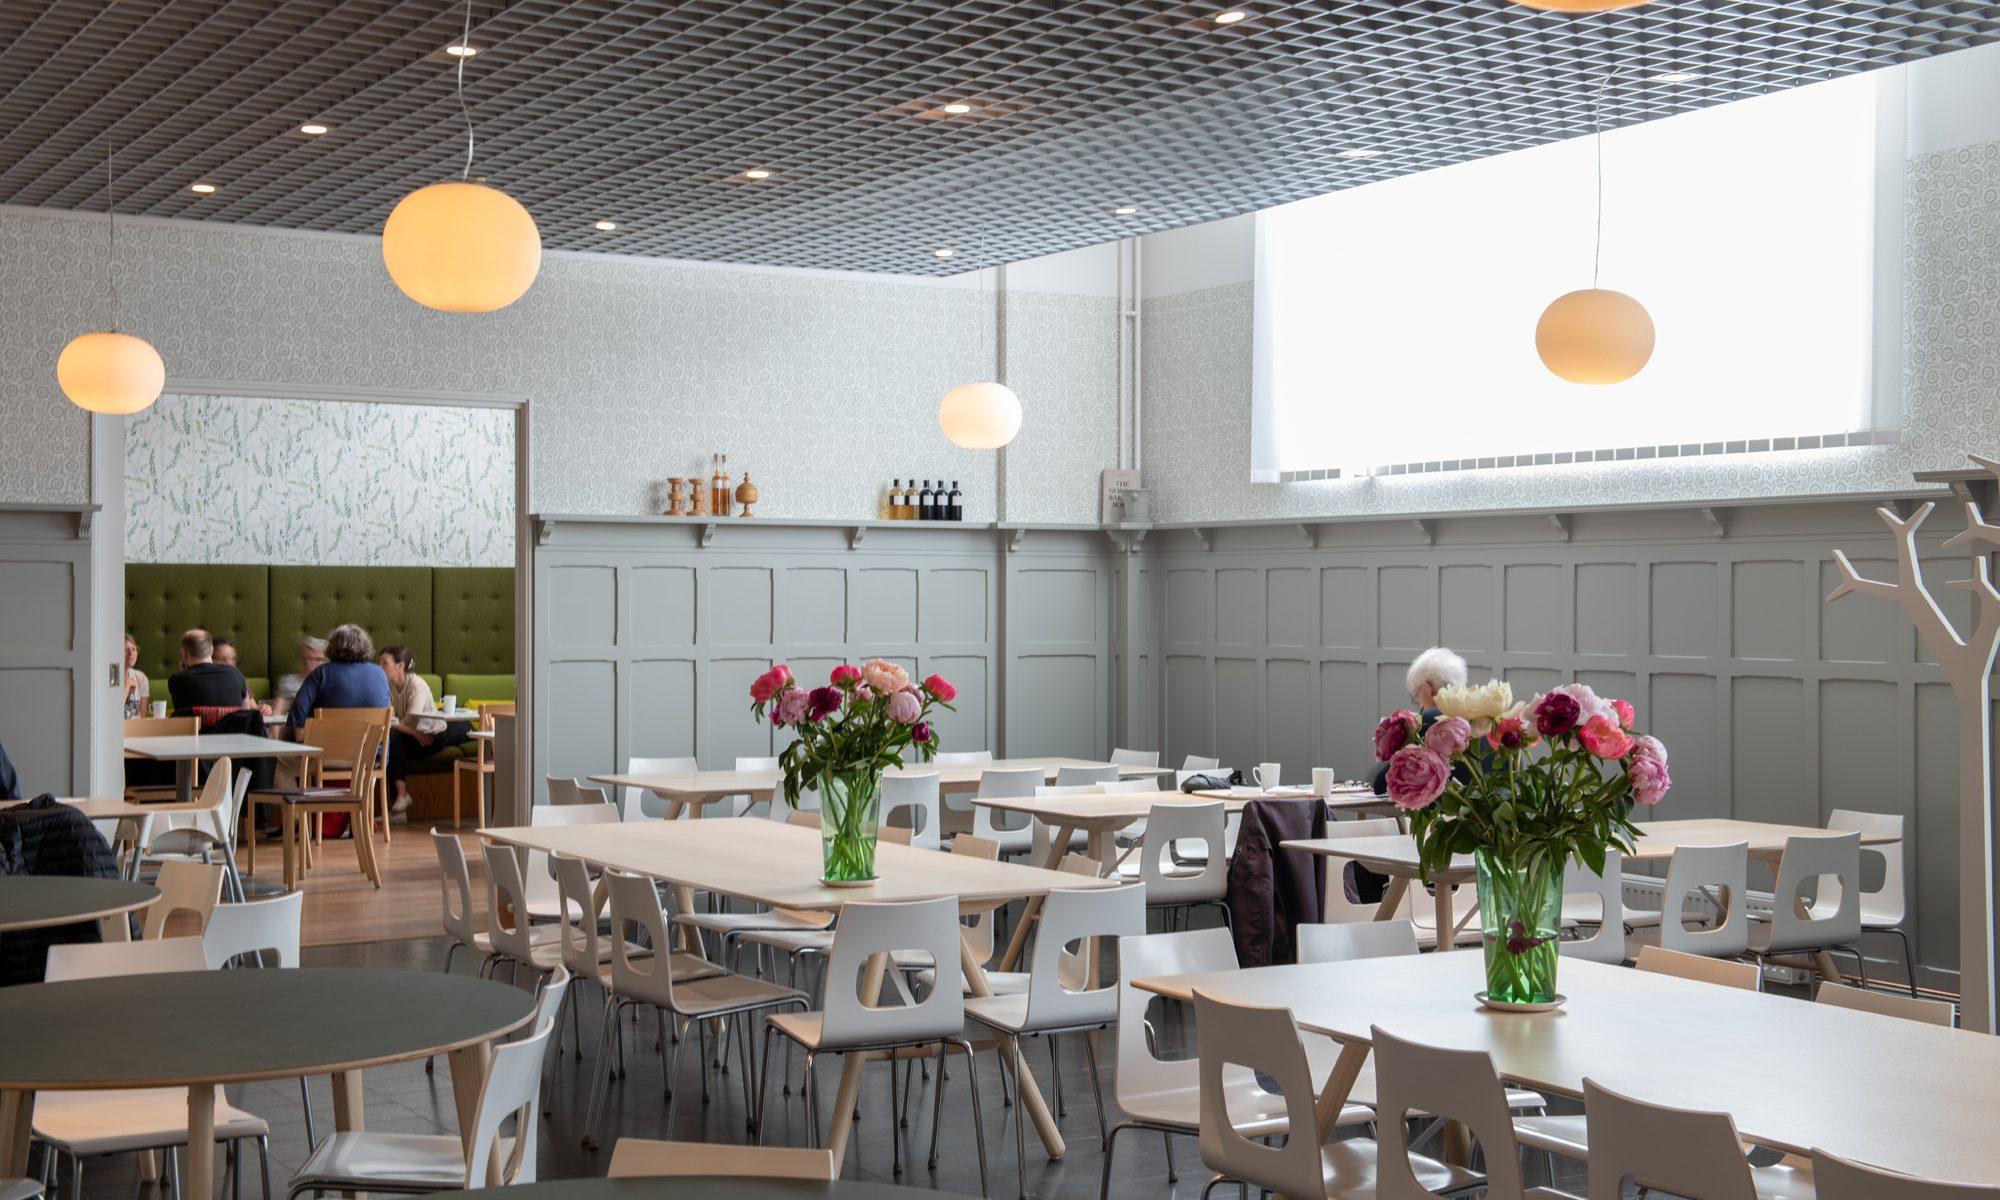 Nordiska museets restaurang